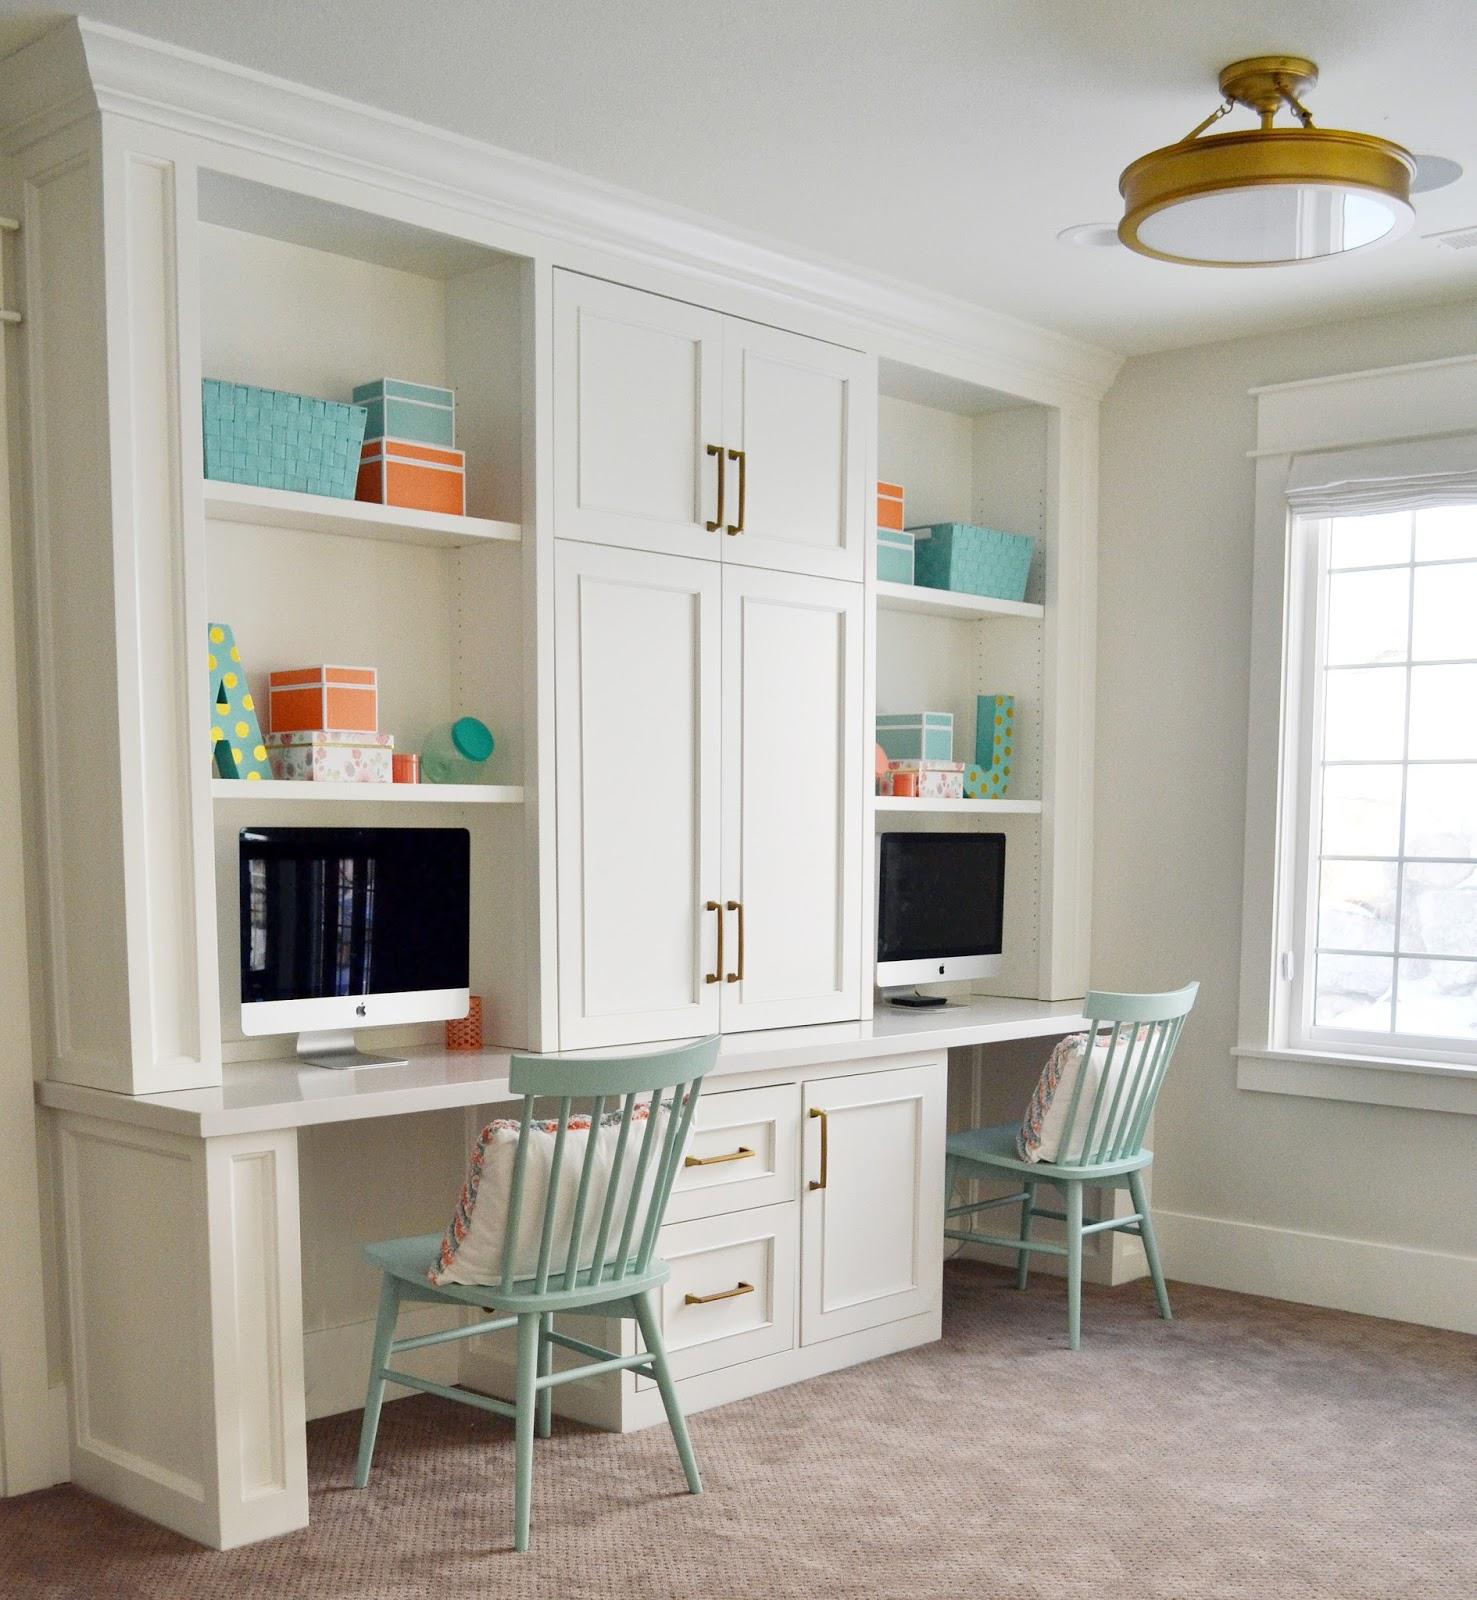 Homeworks Interior Design: Sita Montgomery Interiors: The Primrose Project Girls